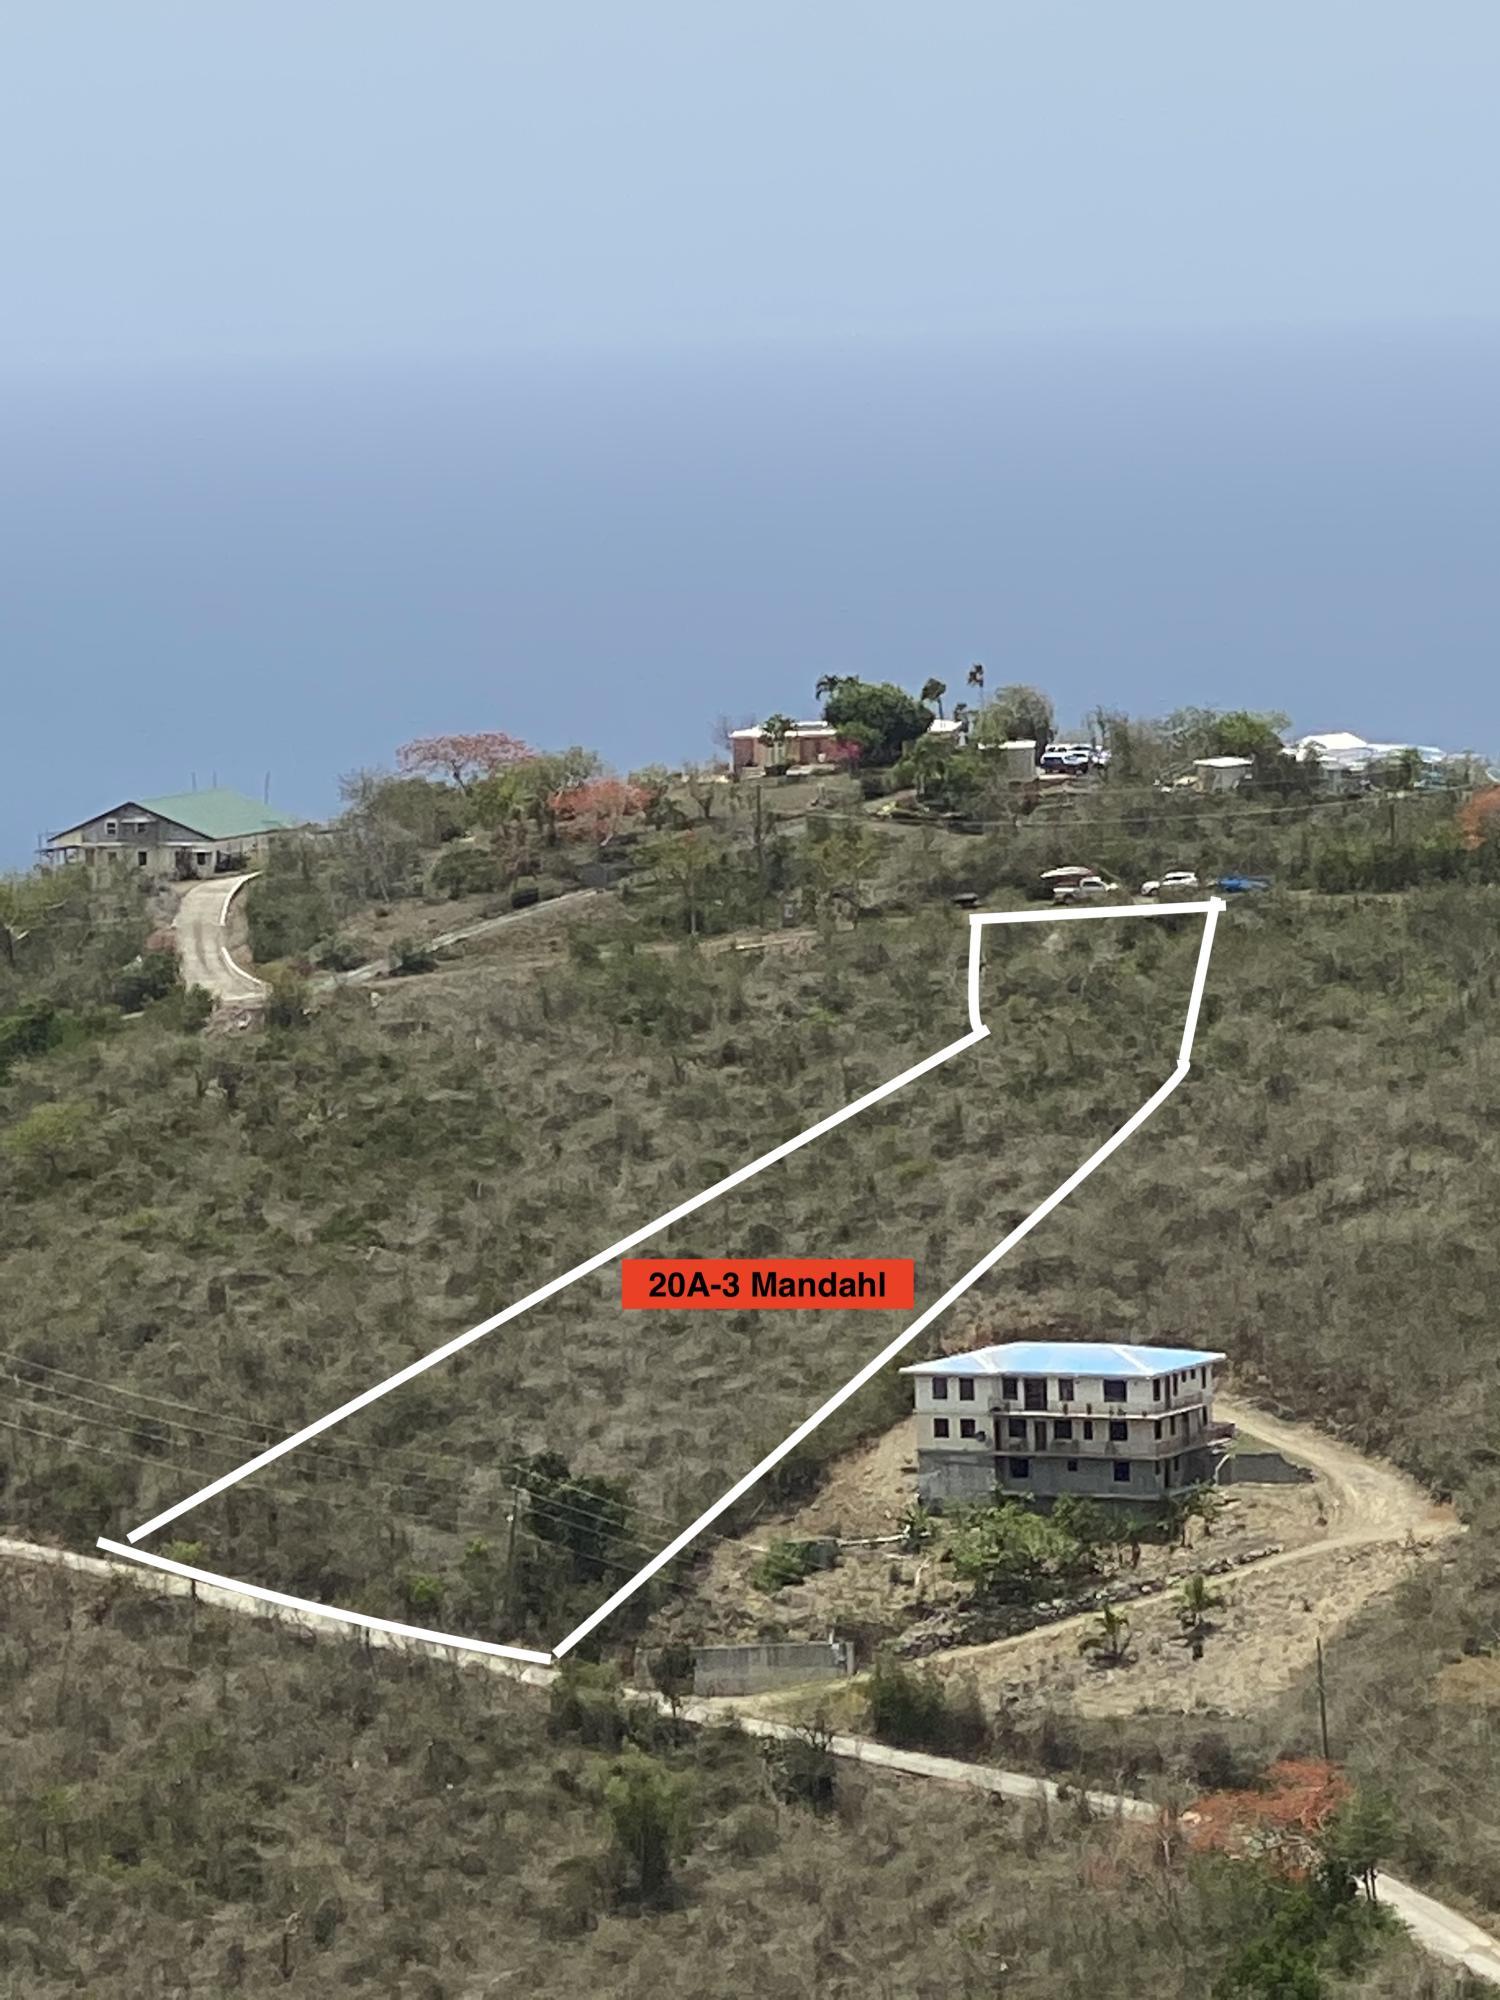 RE/MAX real estate, US Virgin Islands, Mandahl, New Listing  LotsAcres  Mandahl GNS